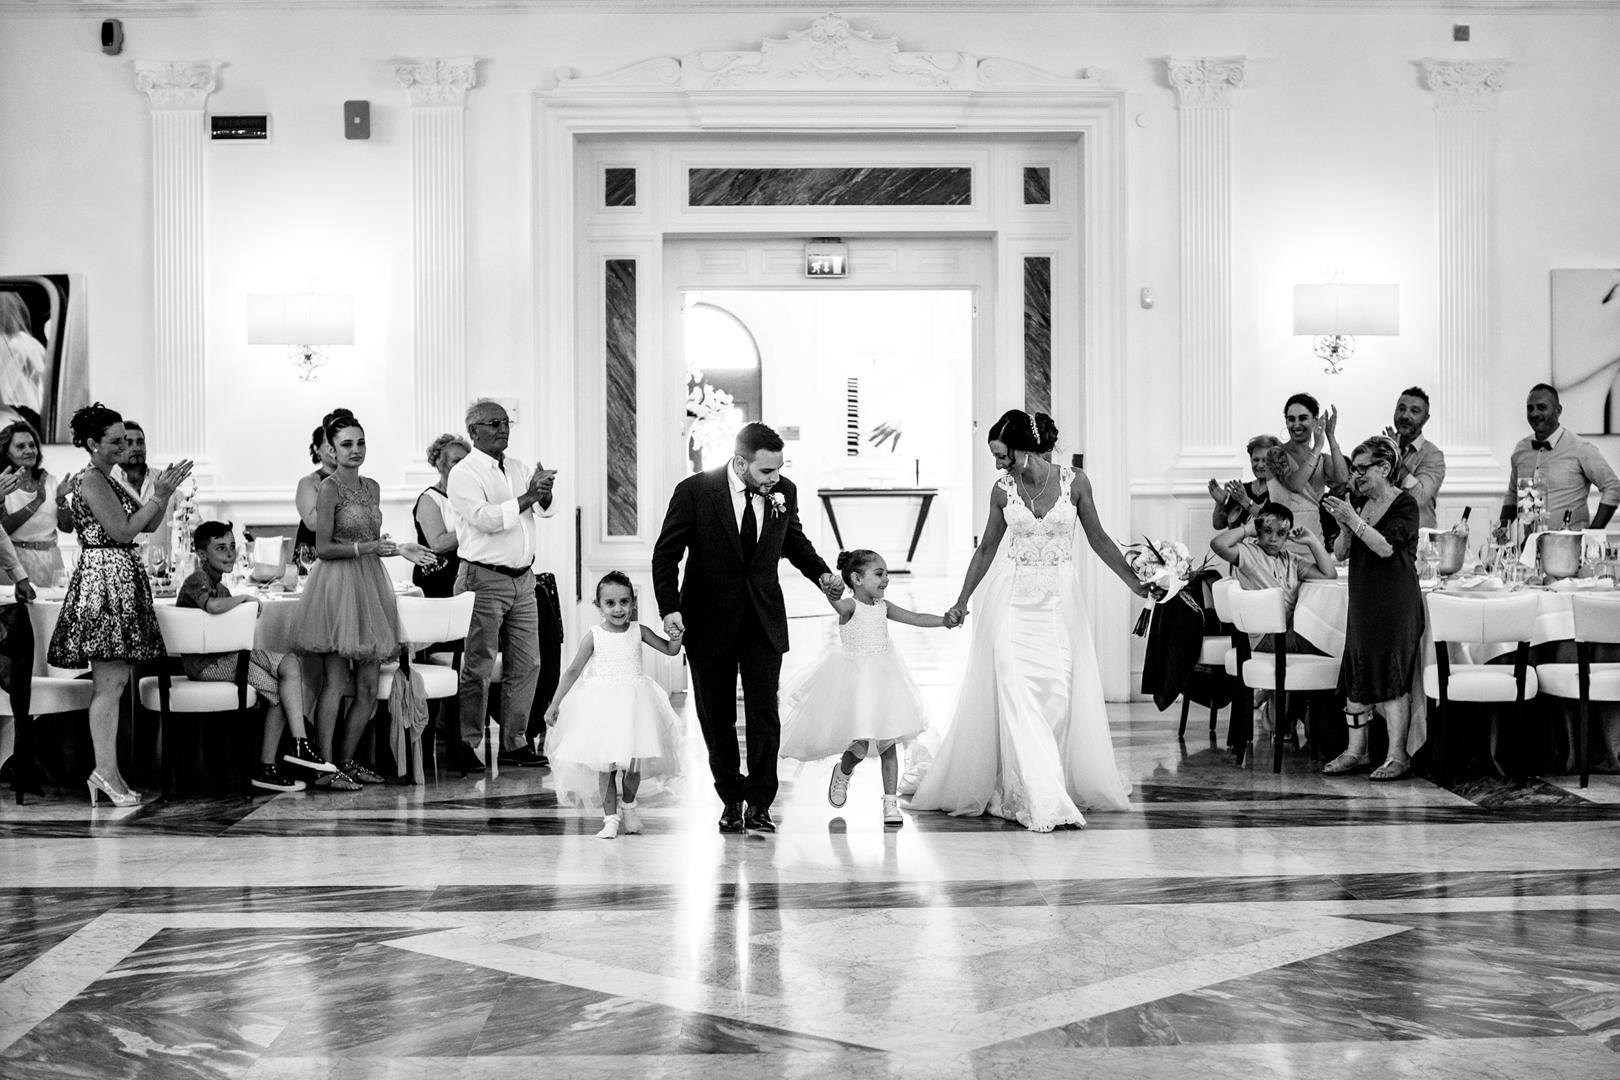 23 gianni-lepore-fotografo-new-lions-entrata-sala-figli-famiglia-weddingday